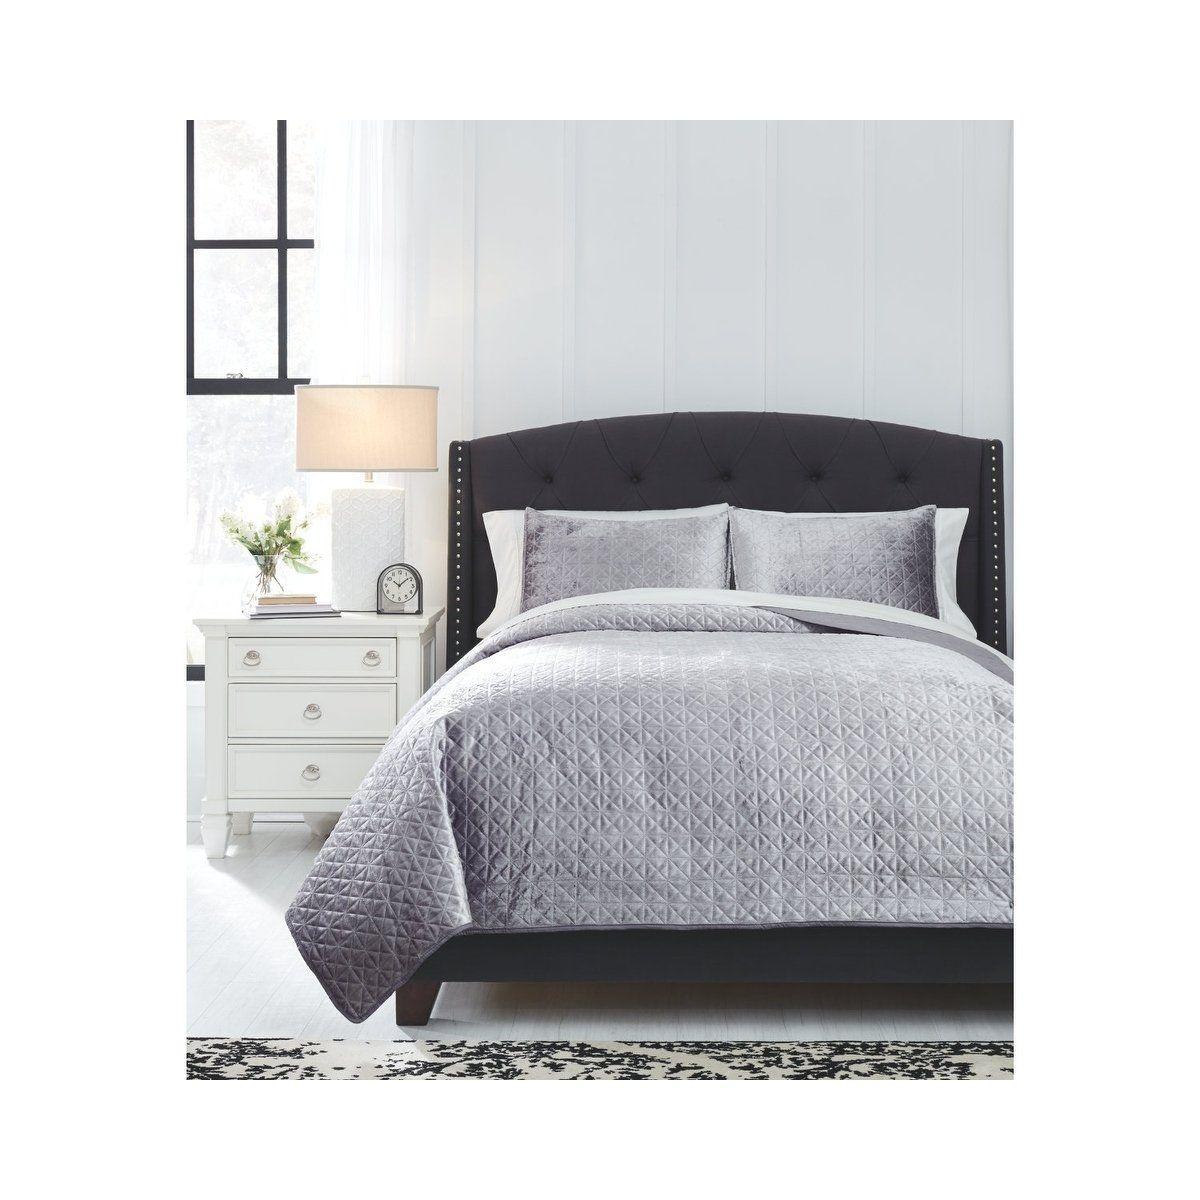 Ashley Furniture Cyrun Gray Queen Duvet Cover Set: Signature Design By Ashley Maryam Gray Queen Coverlet Set